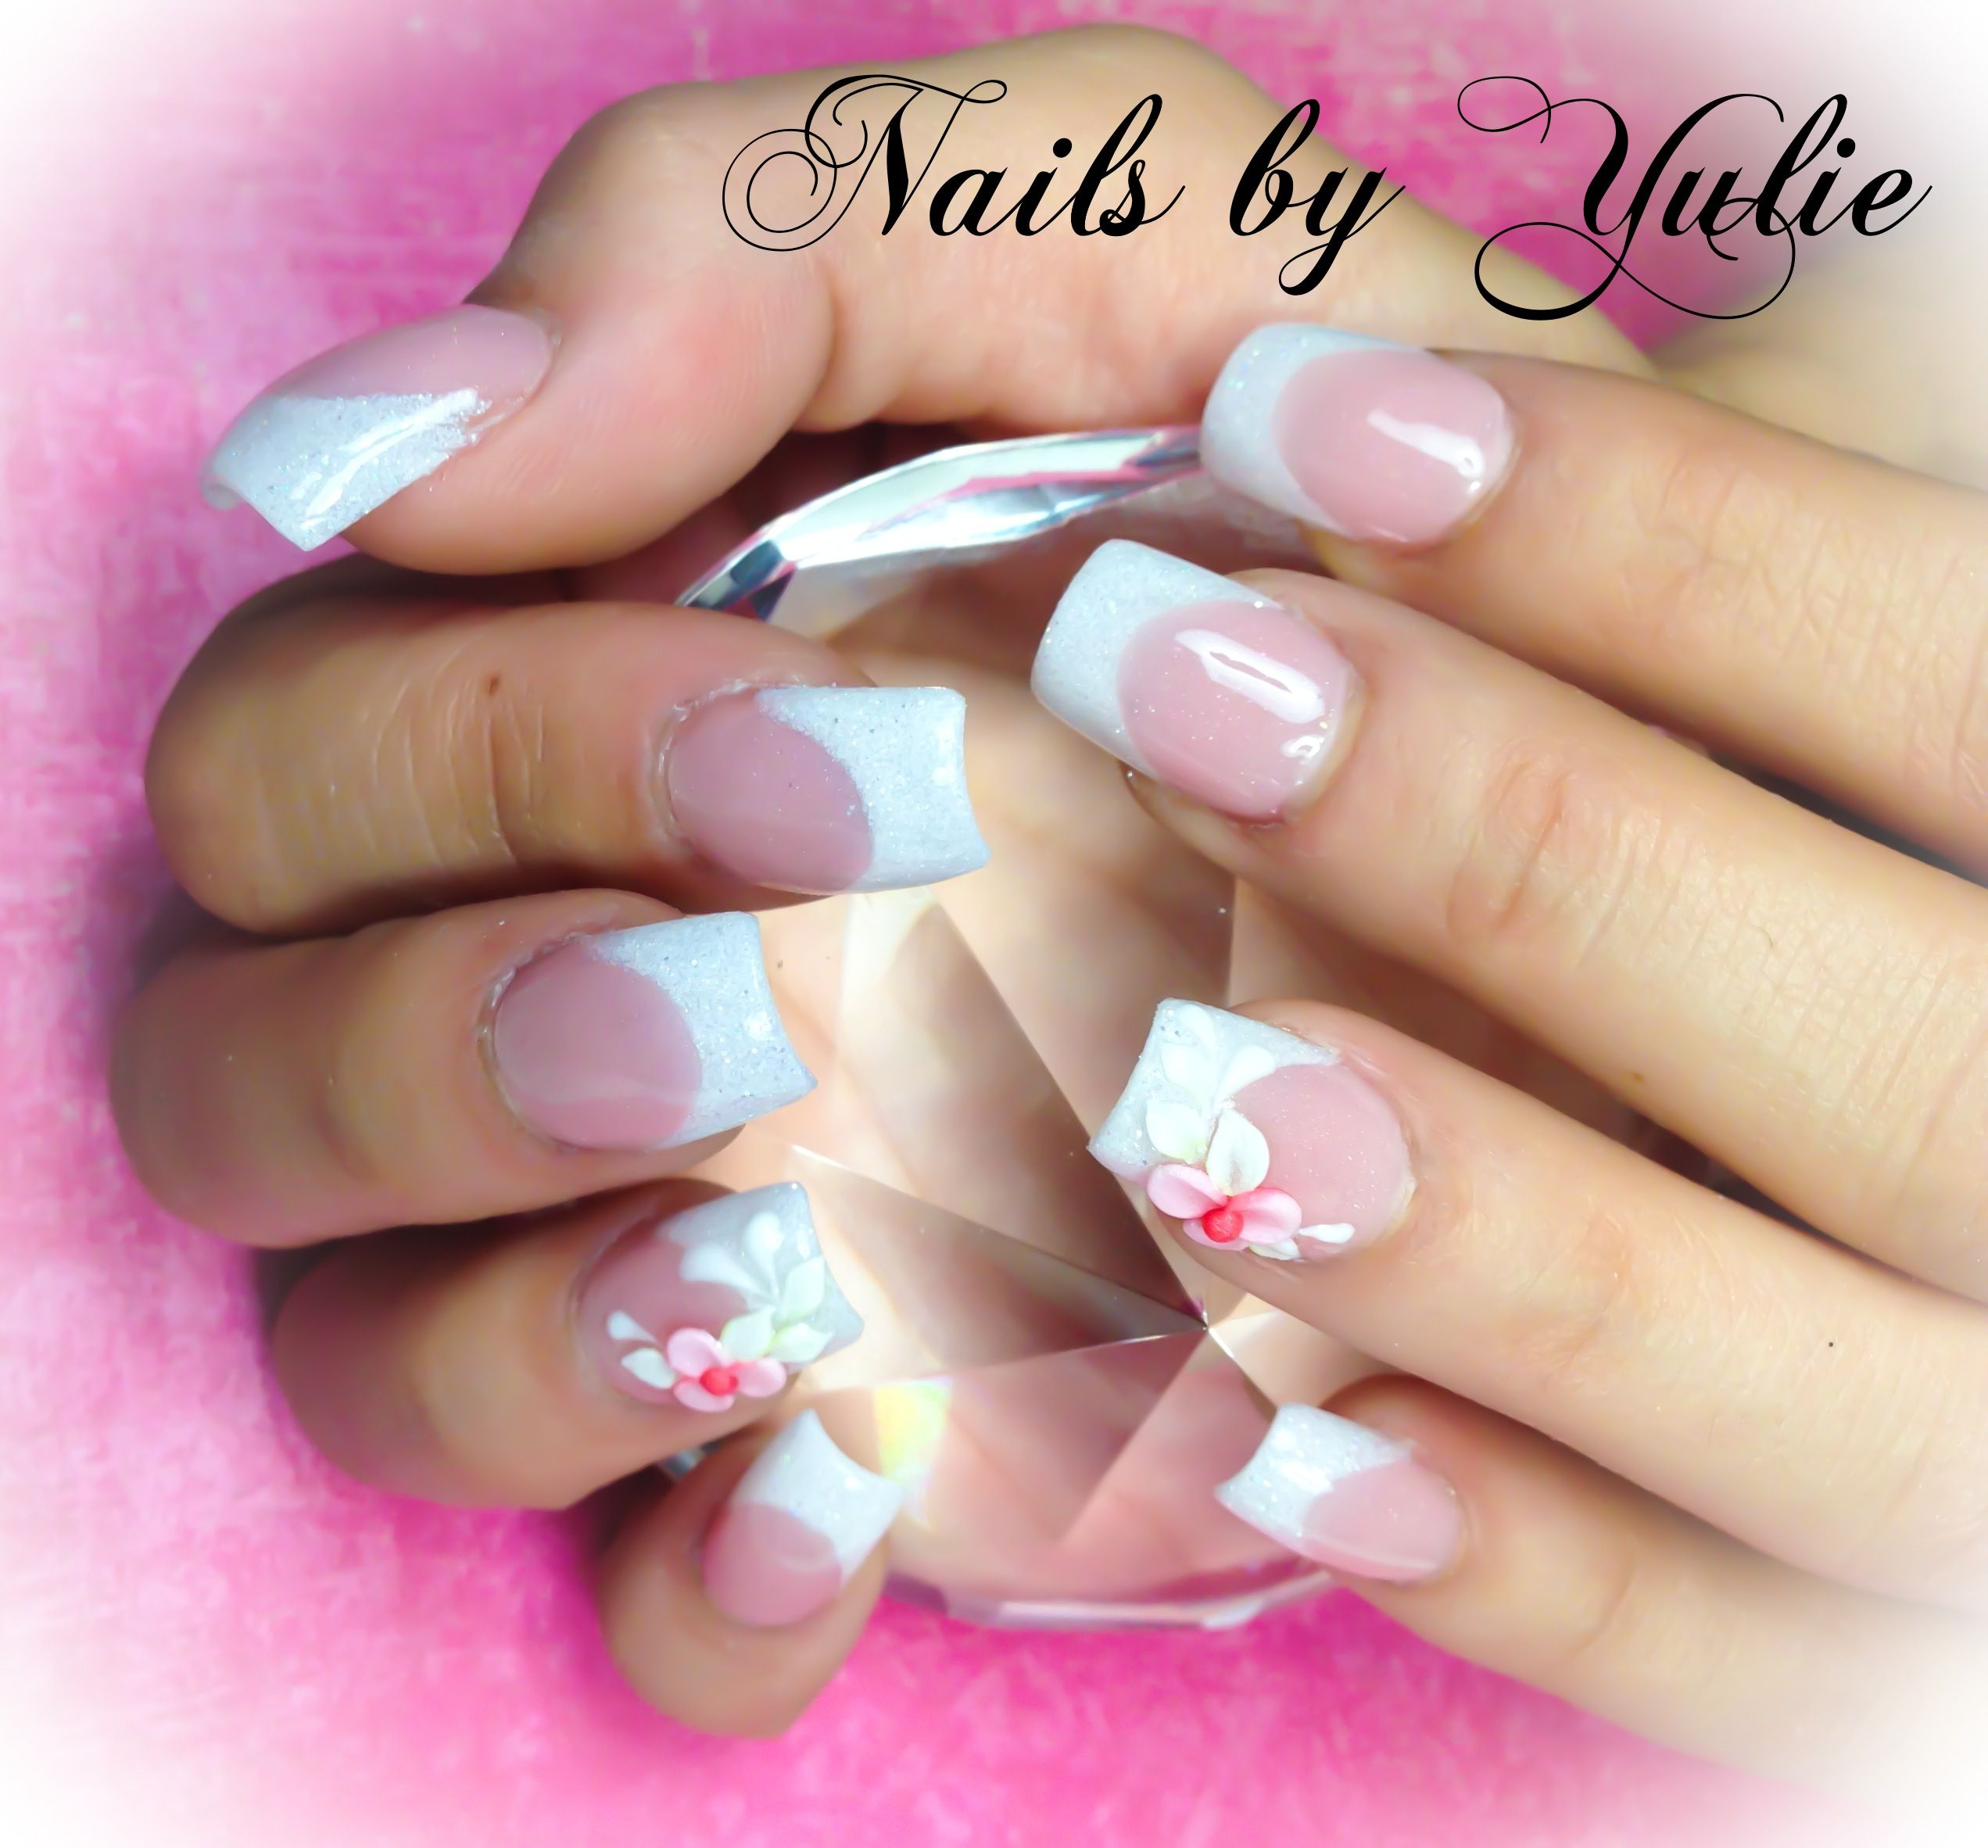 White French. Cute little flowers  #nailart #nailporn #nailqueen #nails2013 #naildesign #nailjunkie #nailartclub #nailfeature #nailedbyapro #uñas #misuñas #naildesign #3dnails #3dflower #diamonds #diseñodeuñas #uñaschicas #shortnails #gelnails #geltopciar #finishgel #weedingnails #whitefrench #whitetip #3dnails